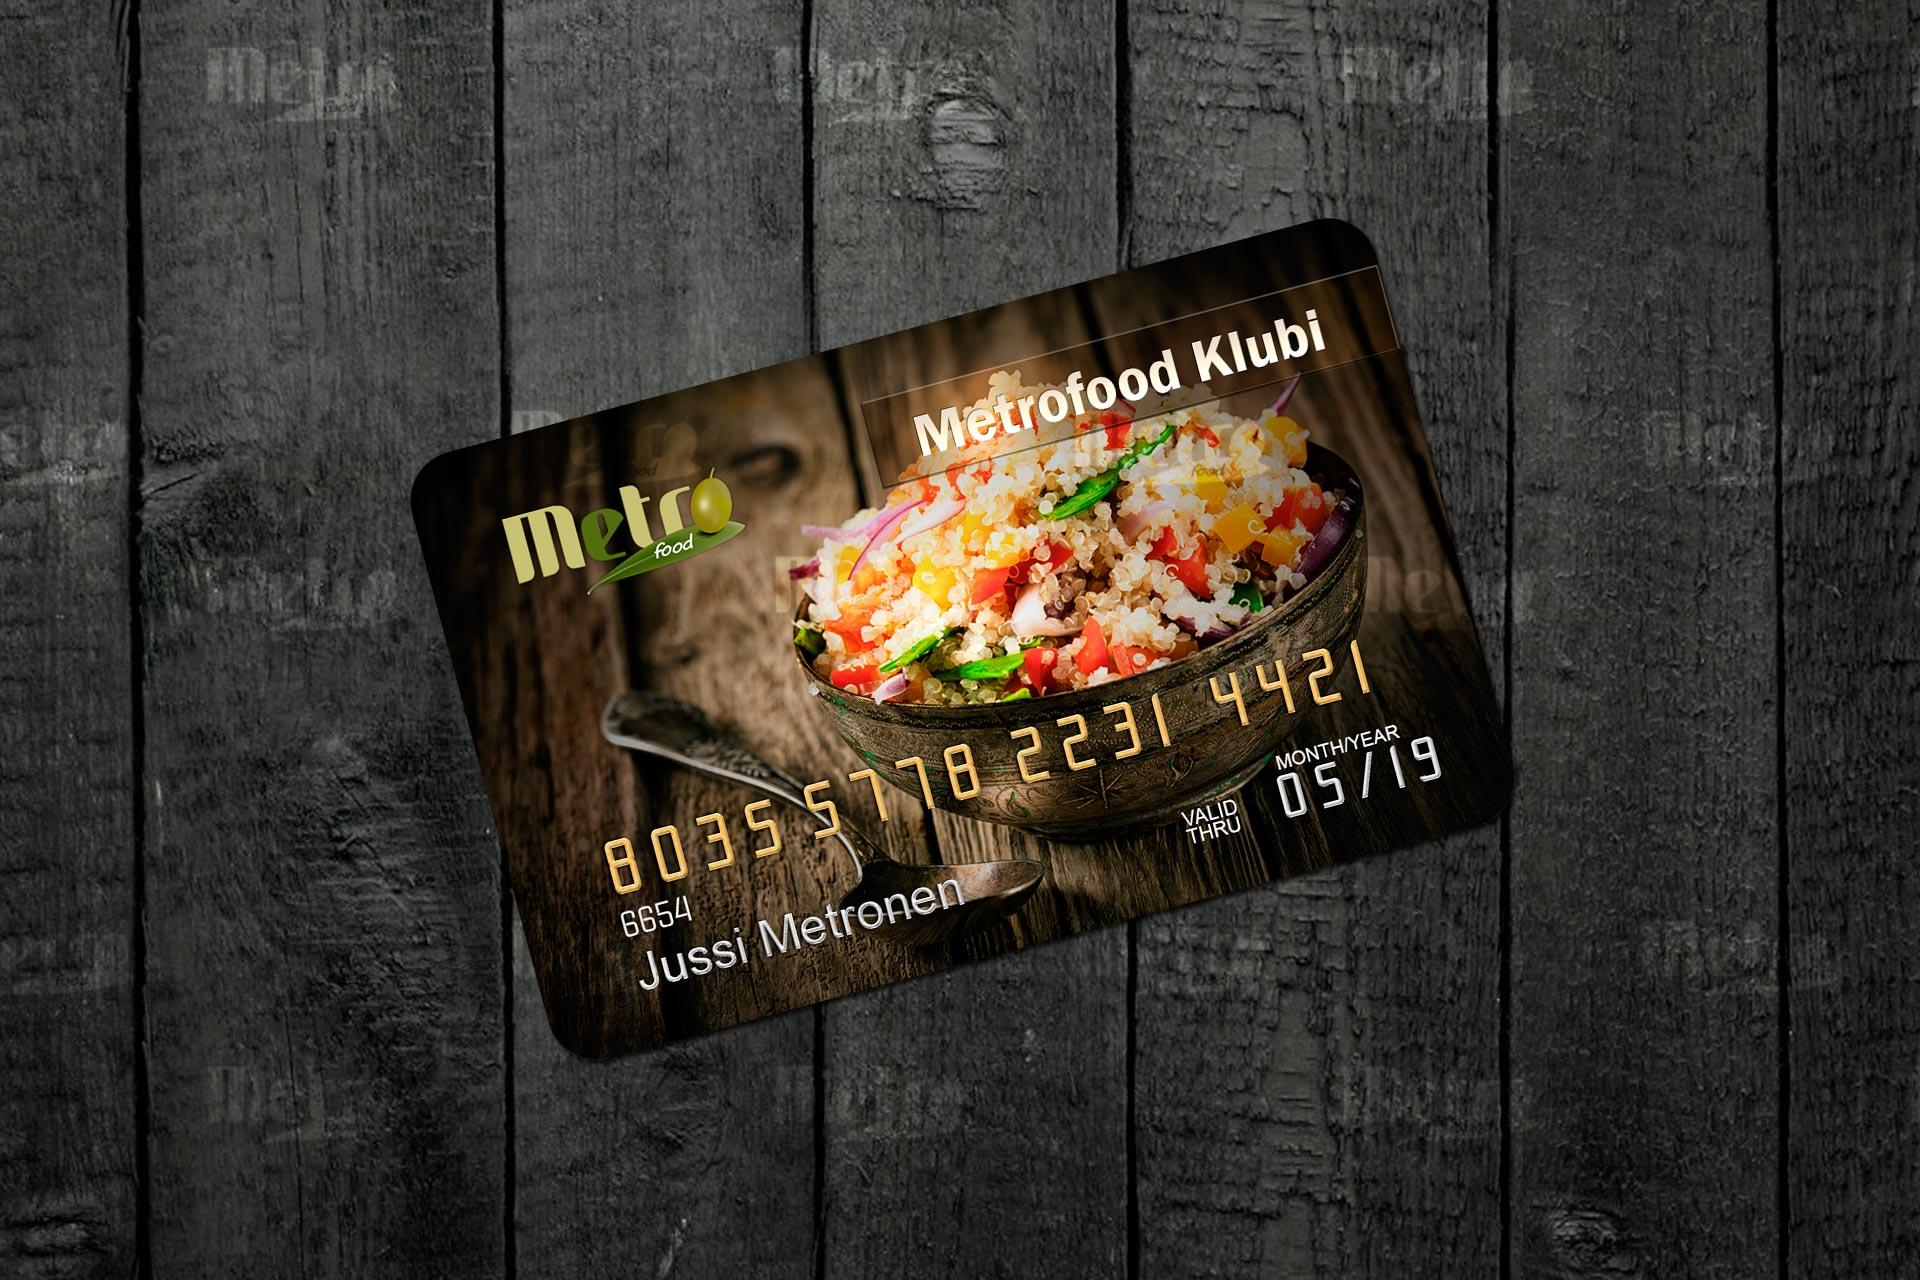 Metrofoodin klubi-kortti